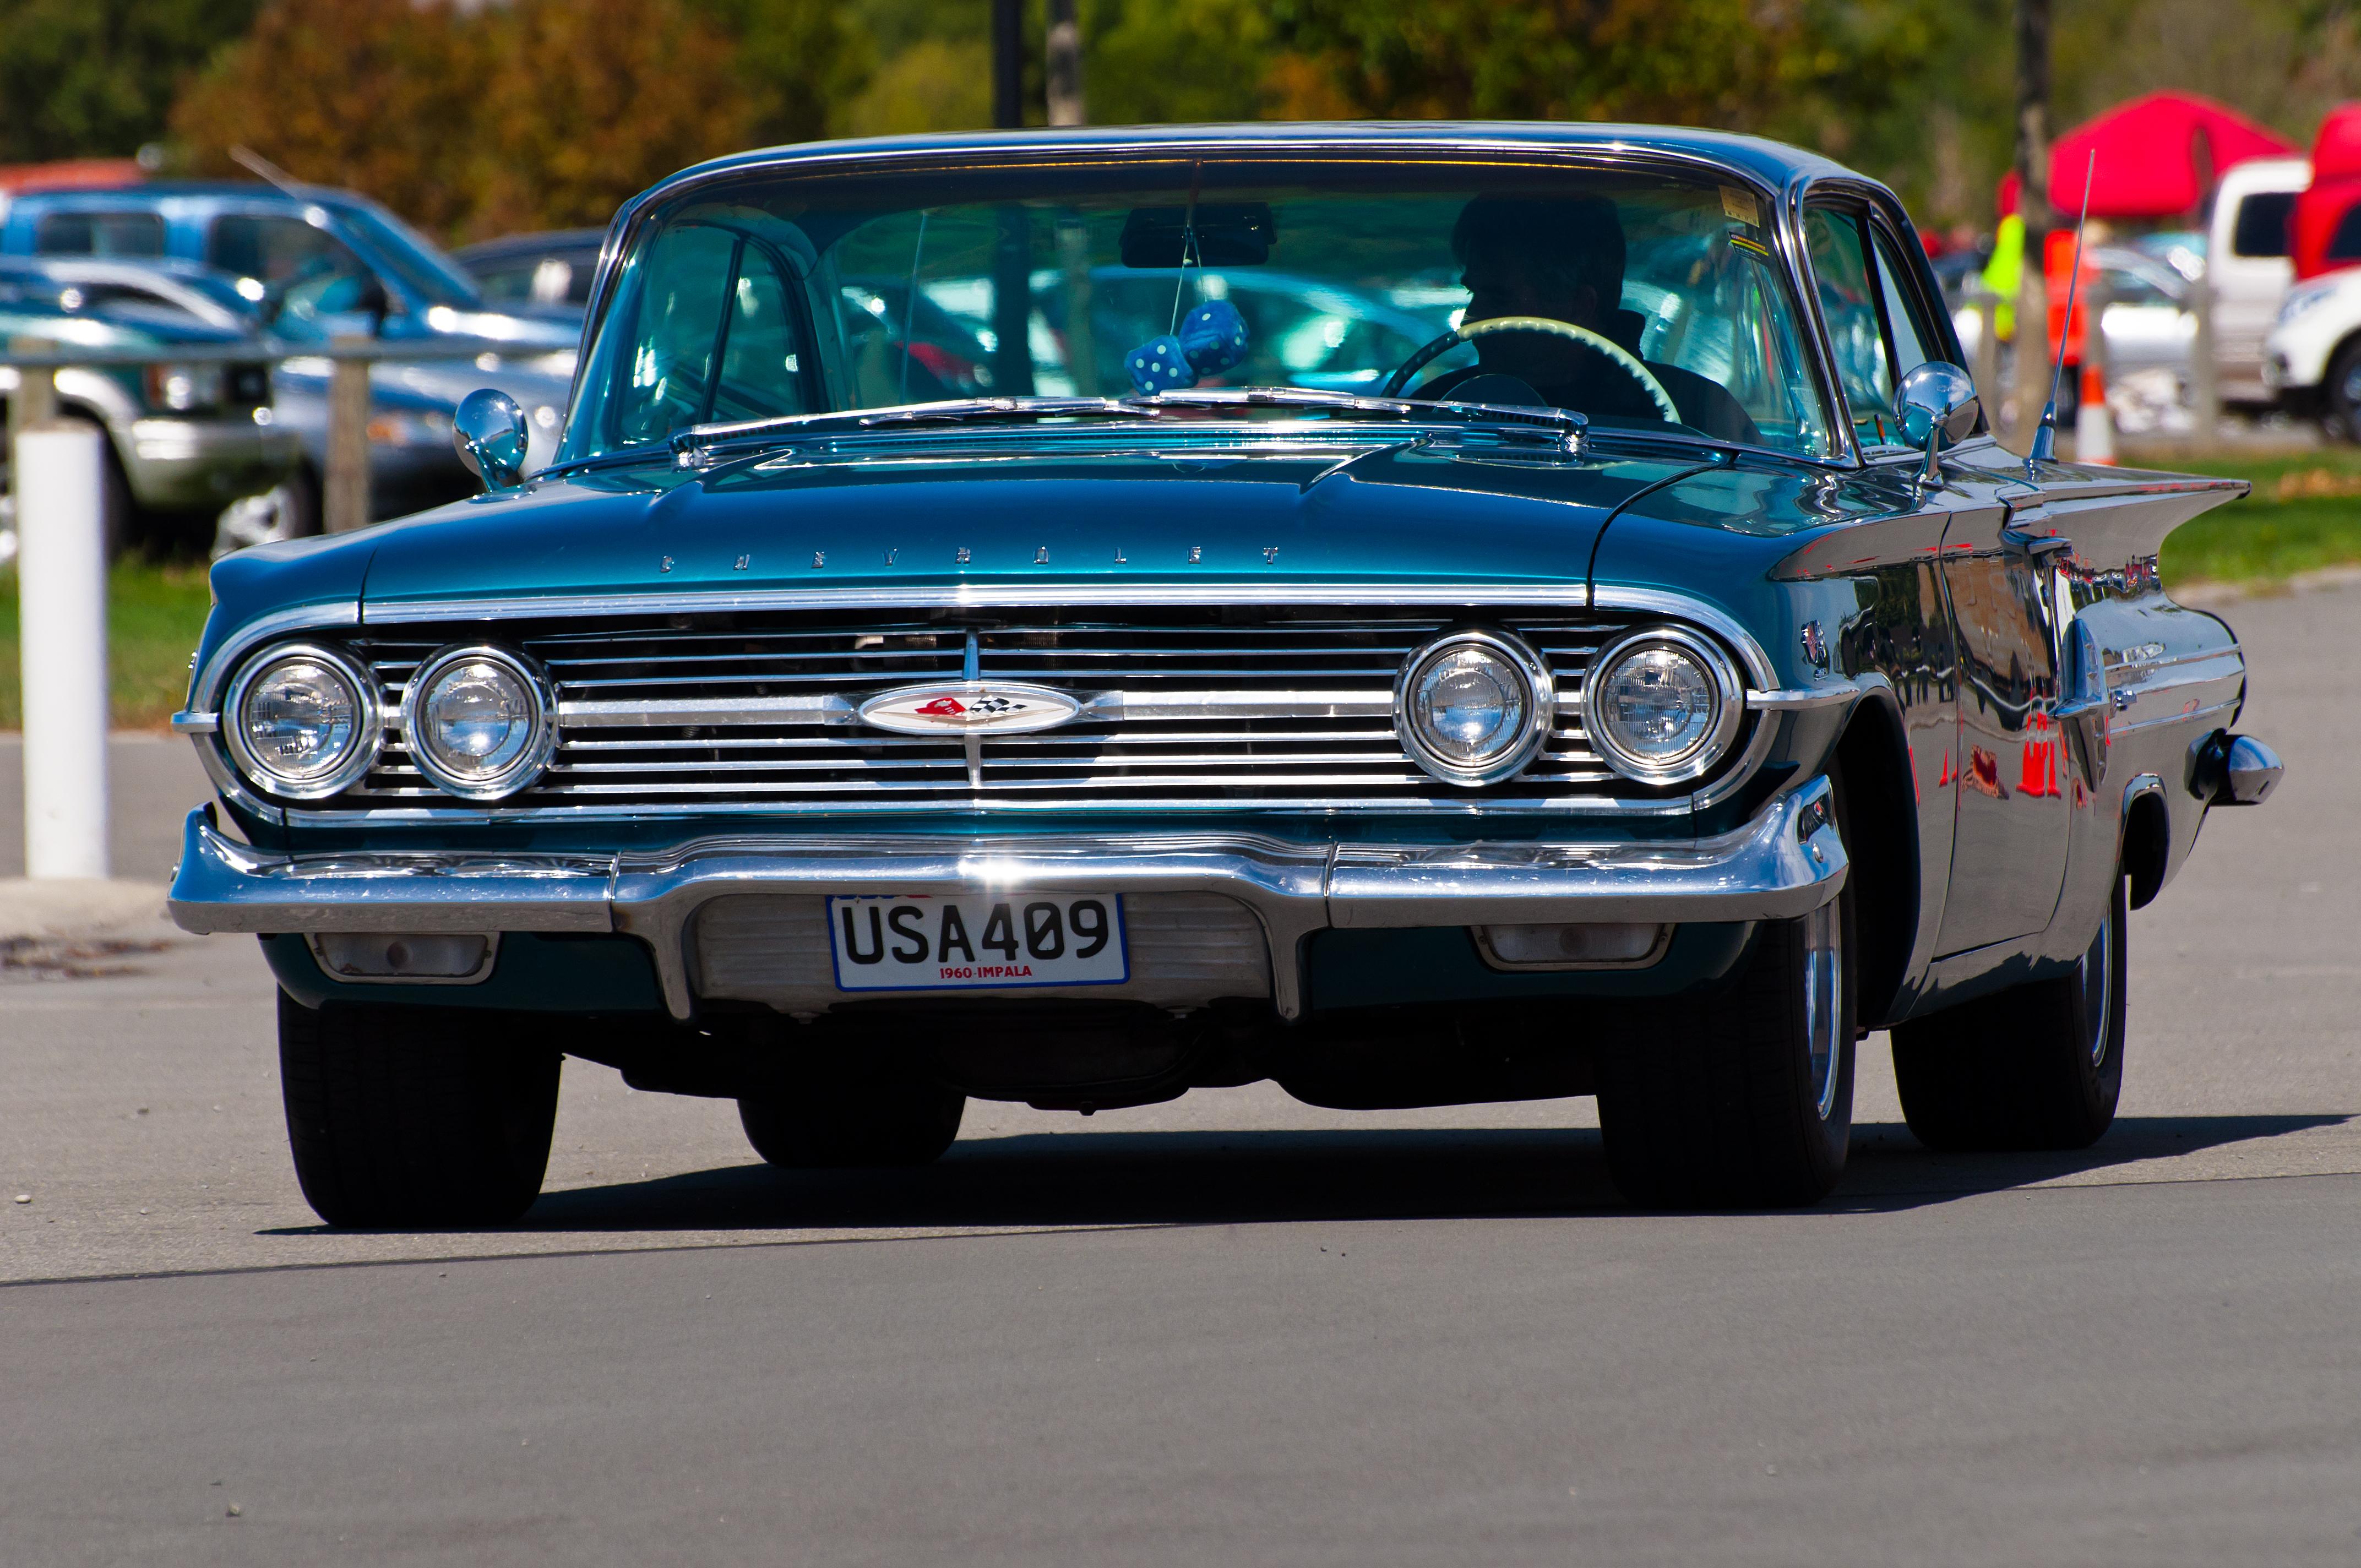 1960 CHEVROLET BISCAYNE IMPALA, 1960, Car, Chevrolet, Impala, HQ Photo